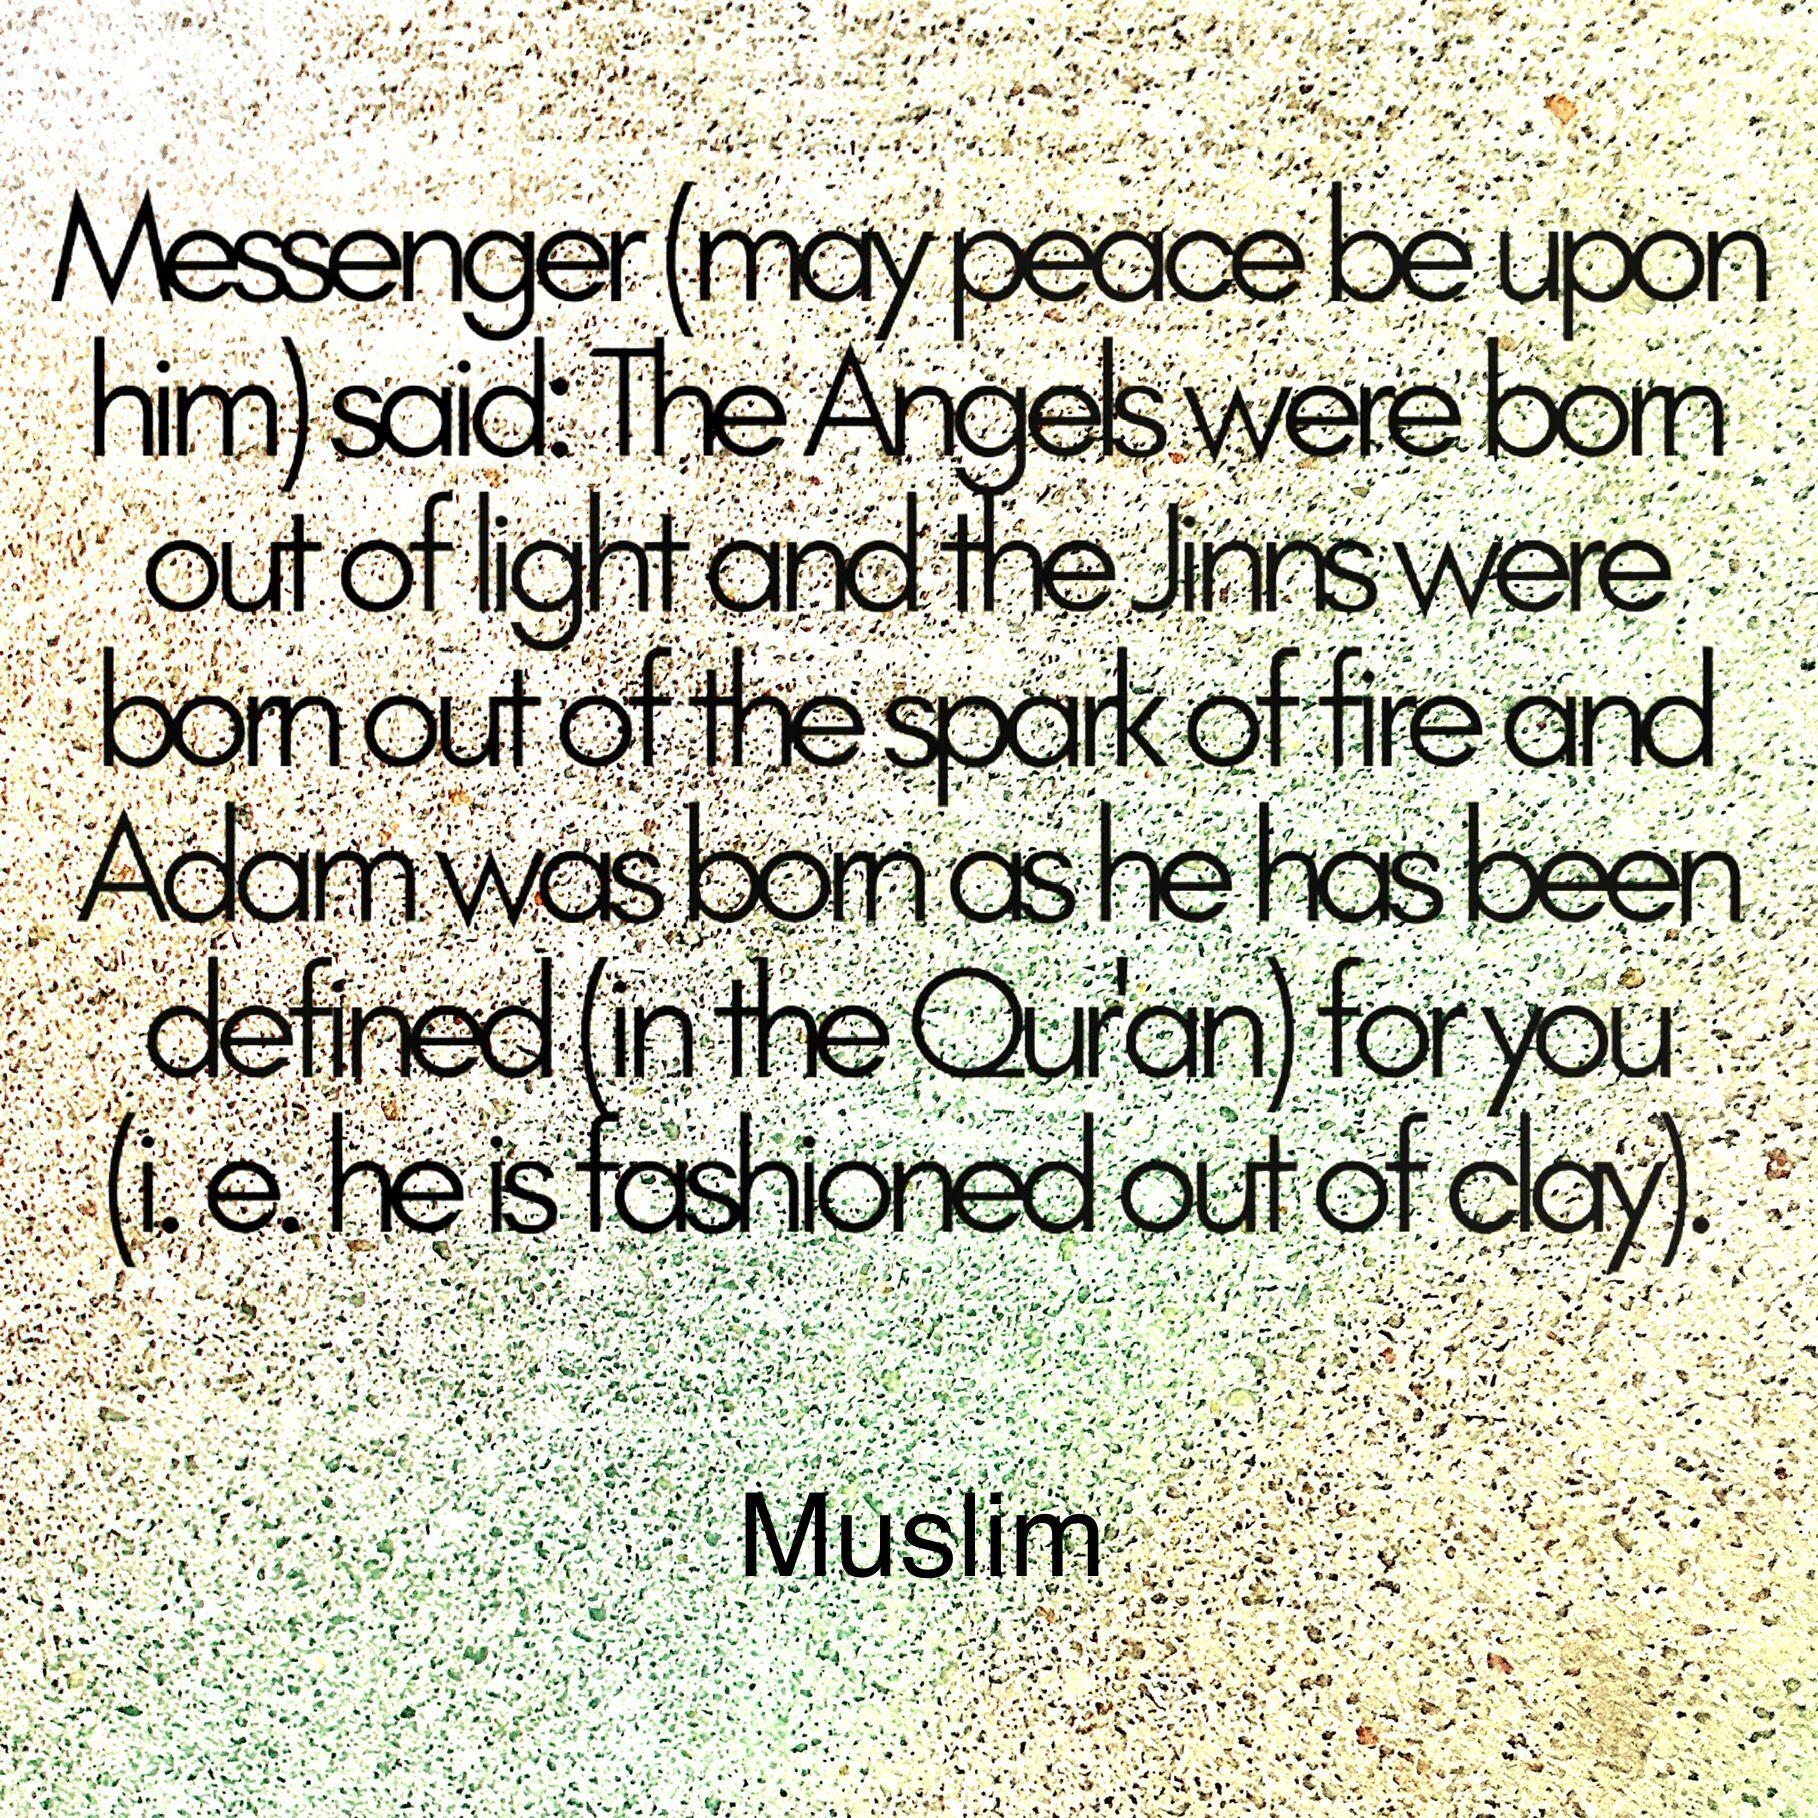 Pin by Islam on Islam | Hadith, Islam, Quran